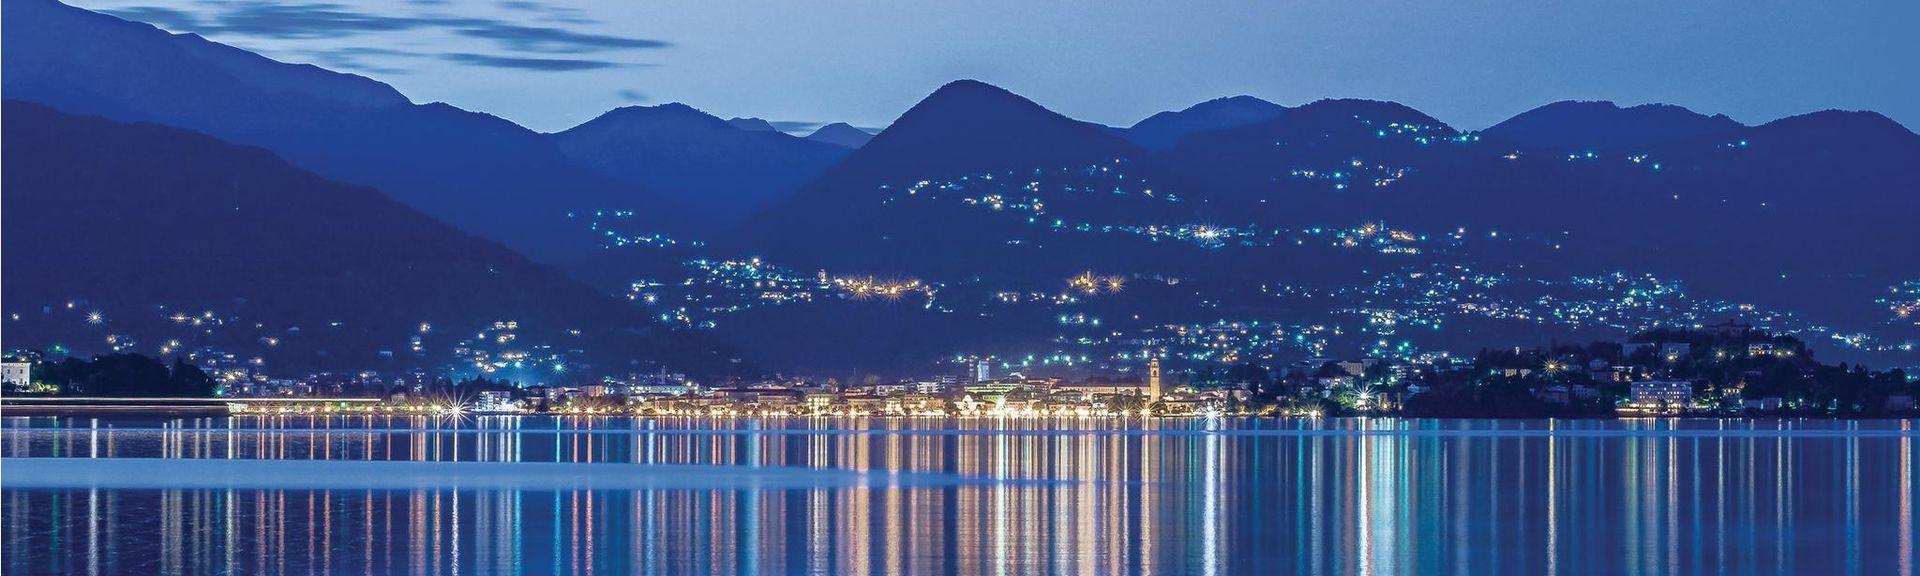 Nonio, Verbano-Cusio-Ossola, Piedmont, Italy